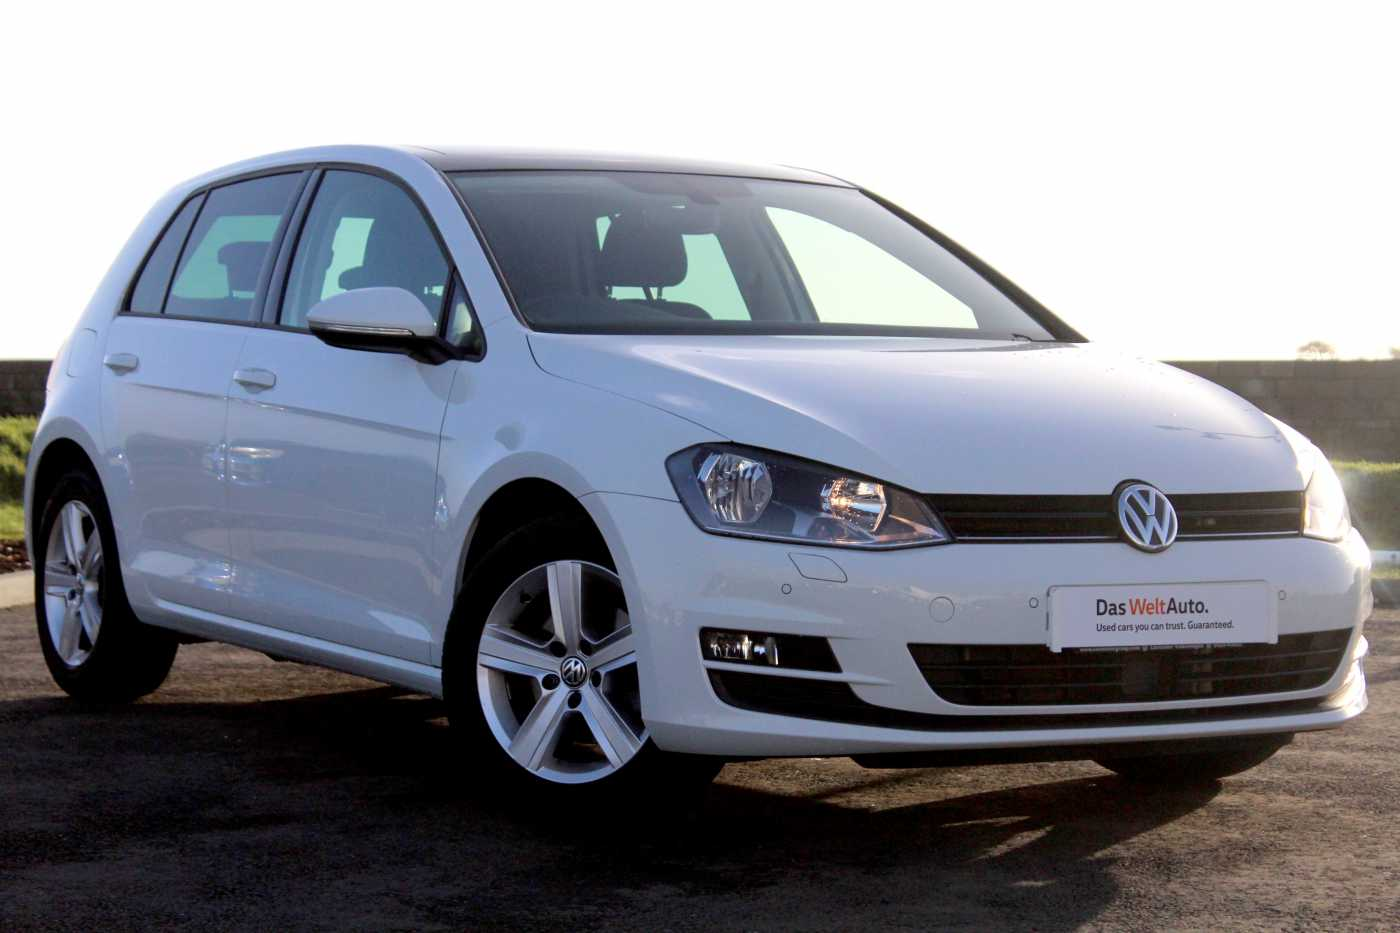 Volkswagen Golf 1.4 TSI Match Edition 125PS 5Dr